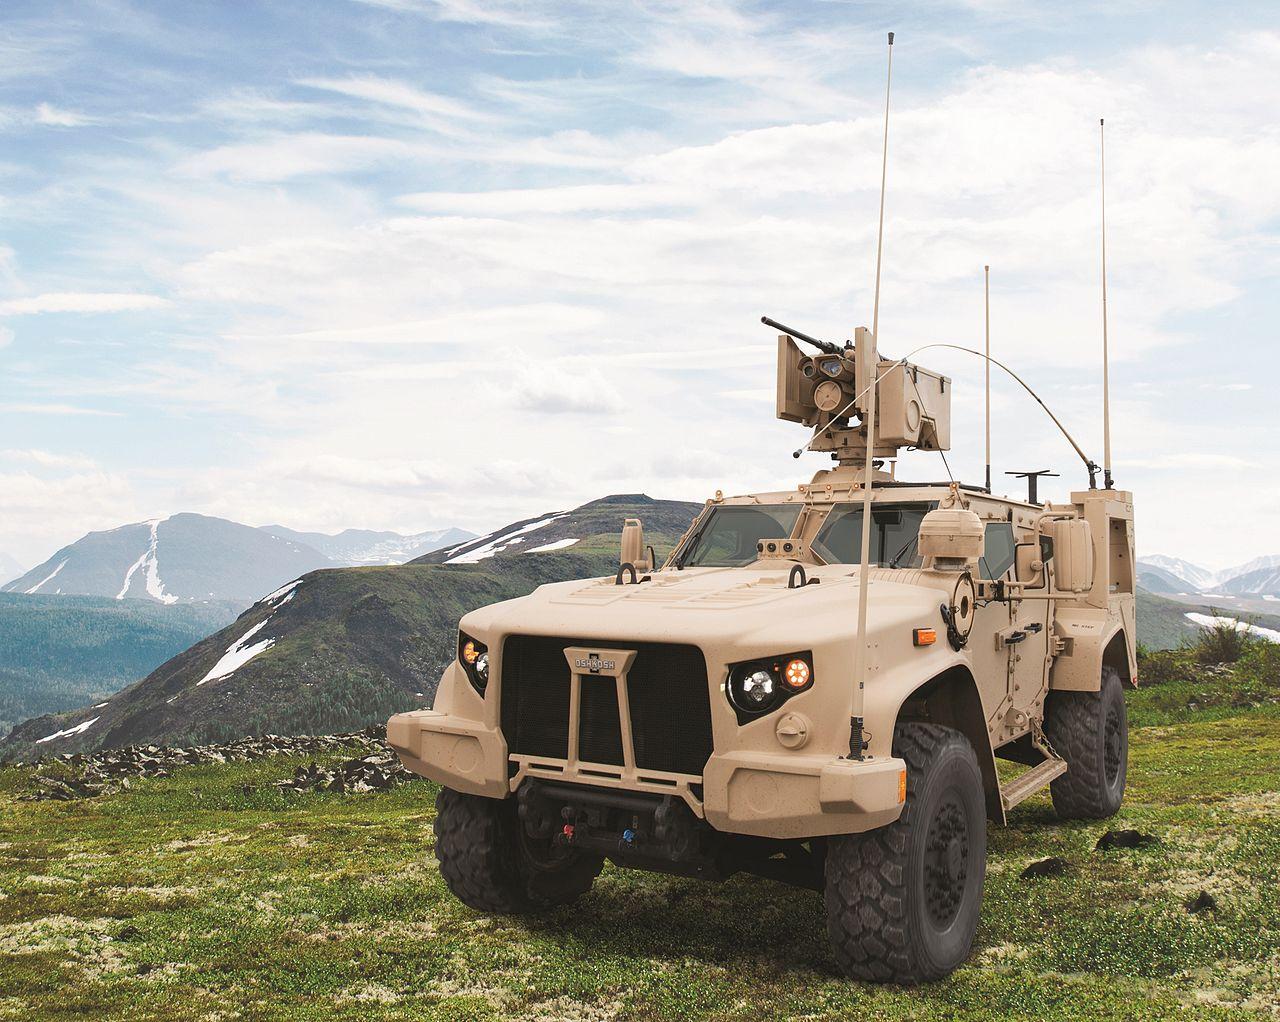 Vozidlo Oshkosh L-ATV, které bude jako JLTV nahrazovat Humvee. Kredit: Oshkosh Defense.